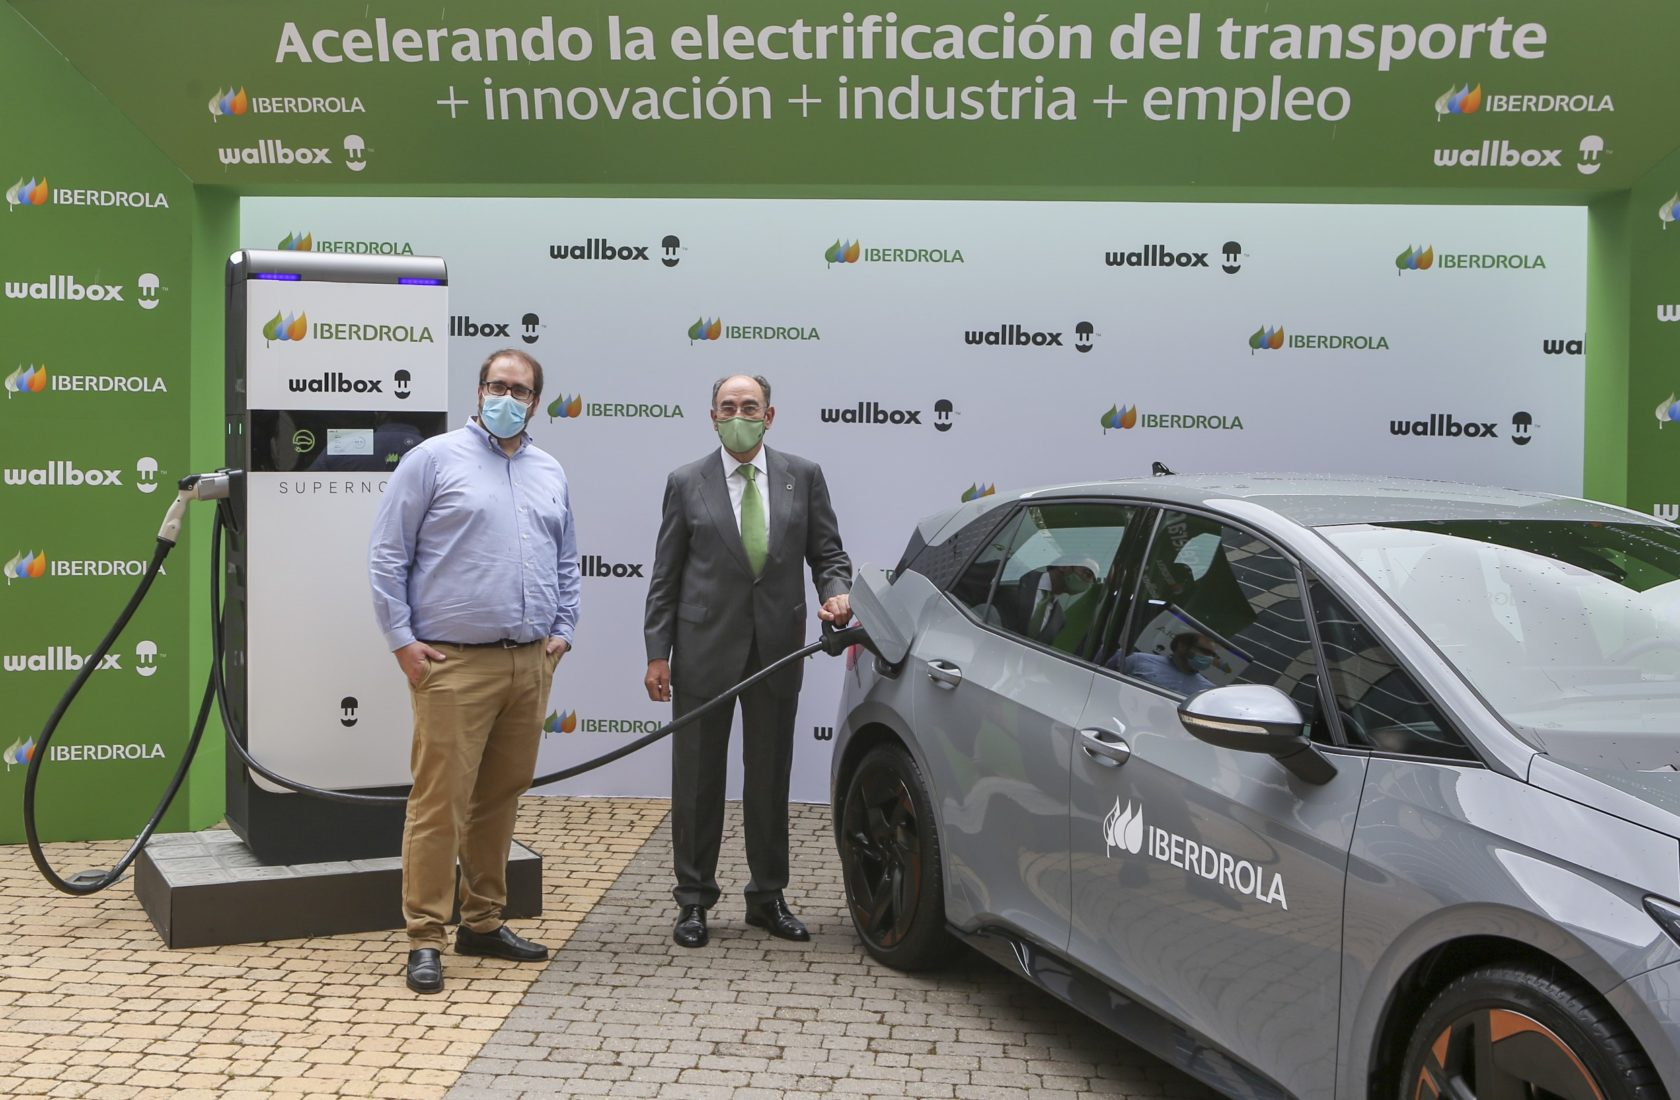 Ignacio Galán, president of Iberdrola, and Enric Asunción, CEO of Wallbox, with a Supernova, charging a SEAT CUPRA Born